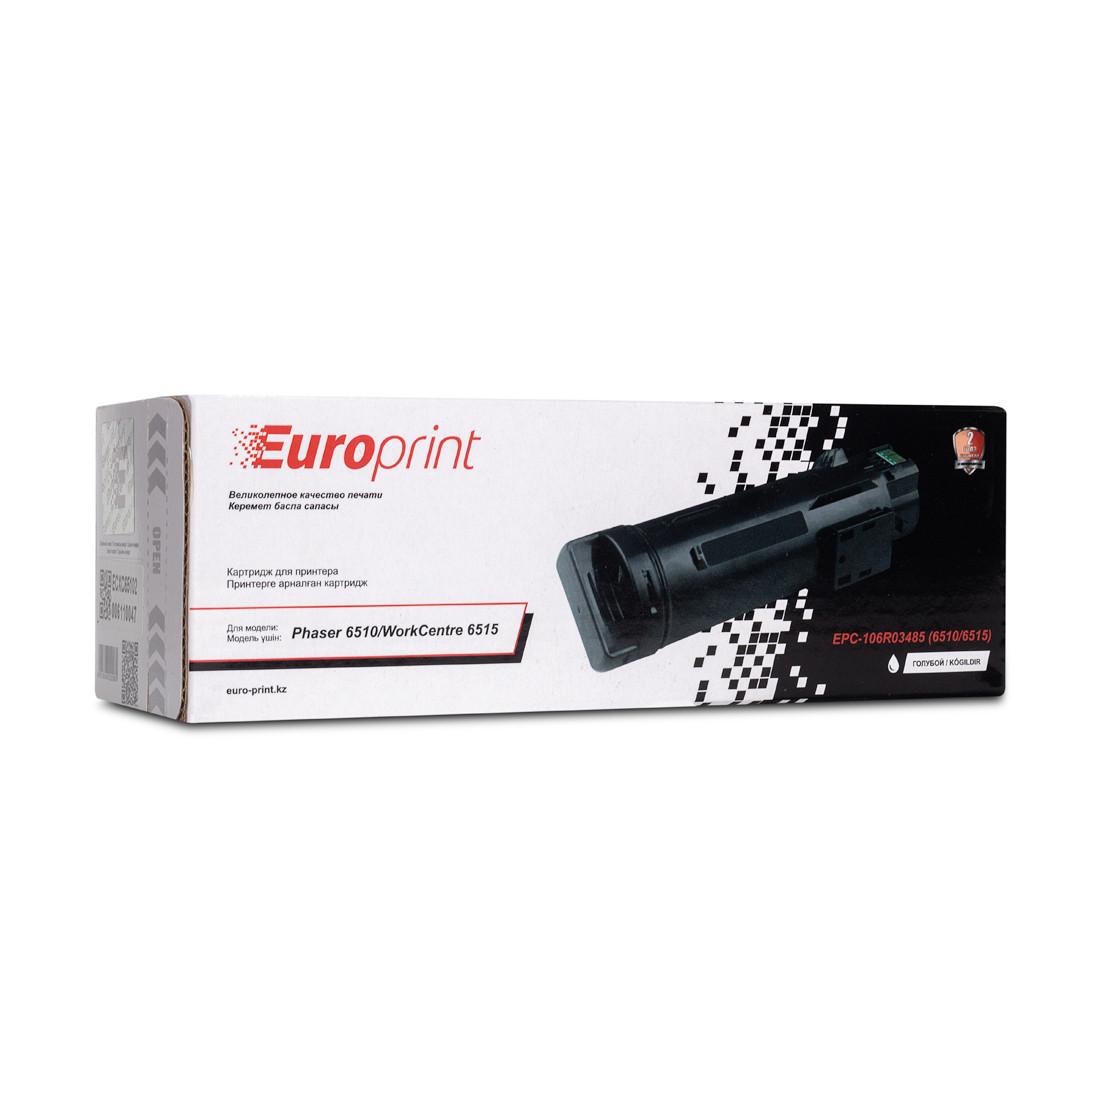 Картридж Europrint EPC-106R03488 Чёрный (6510/6515)